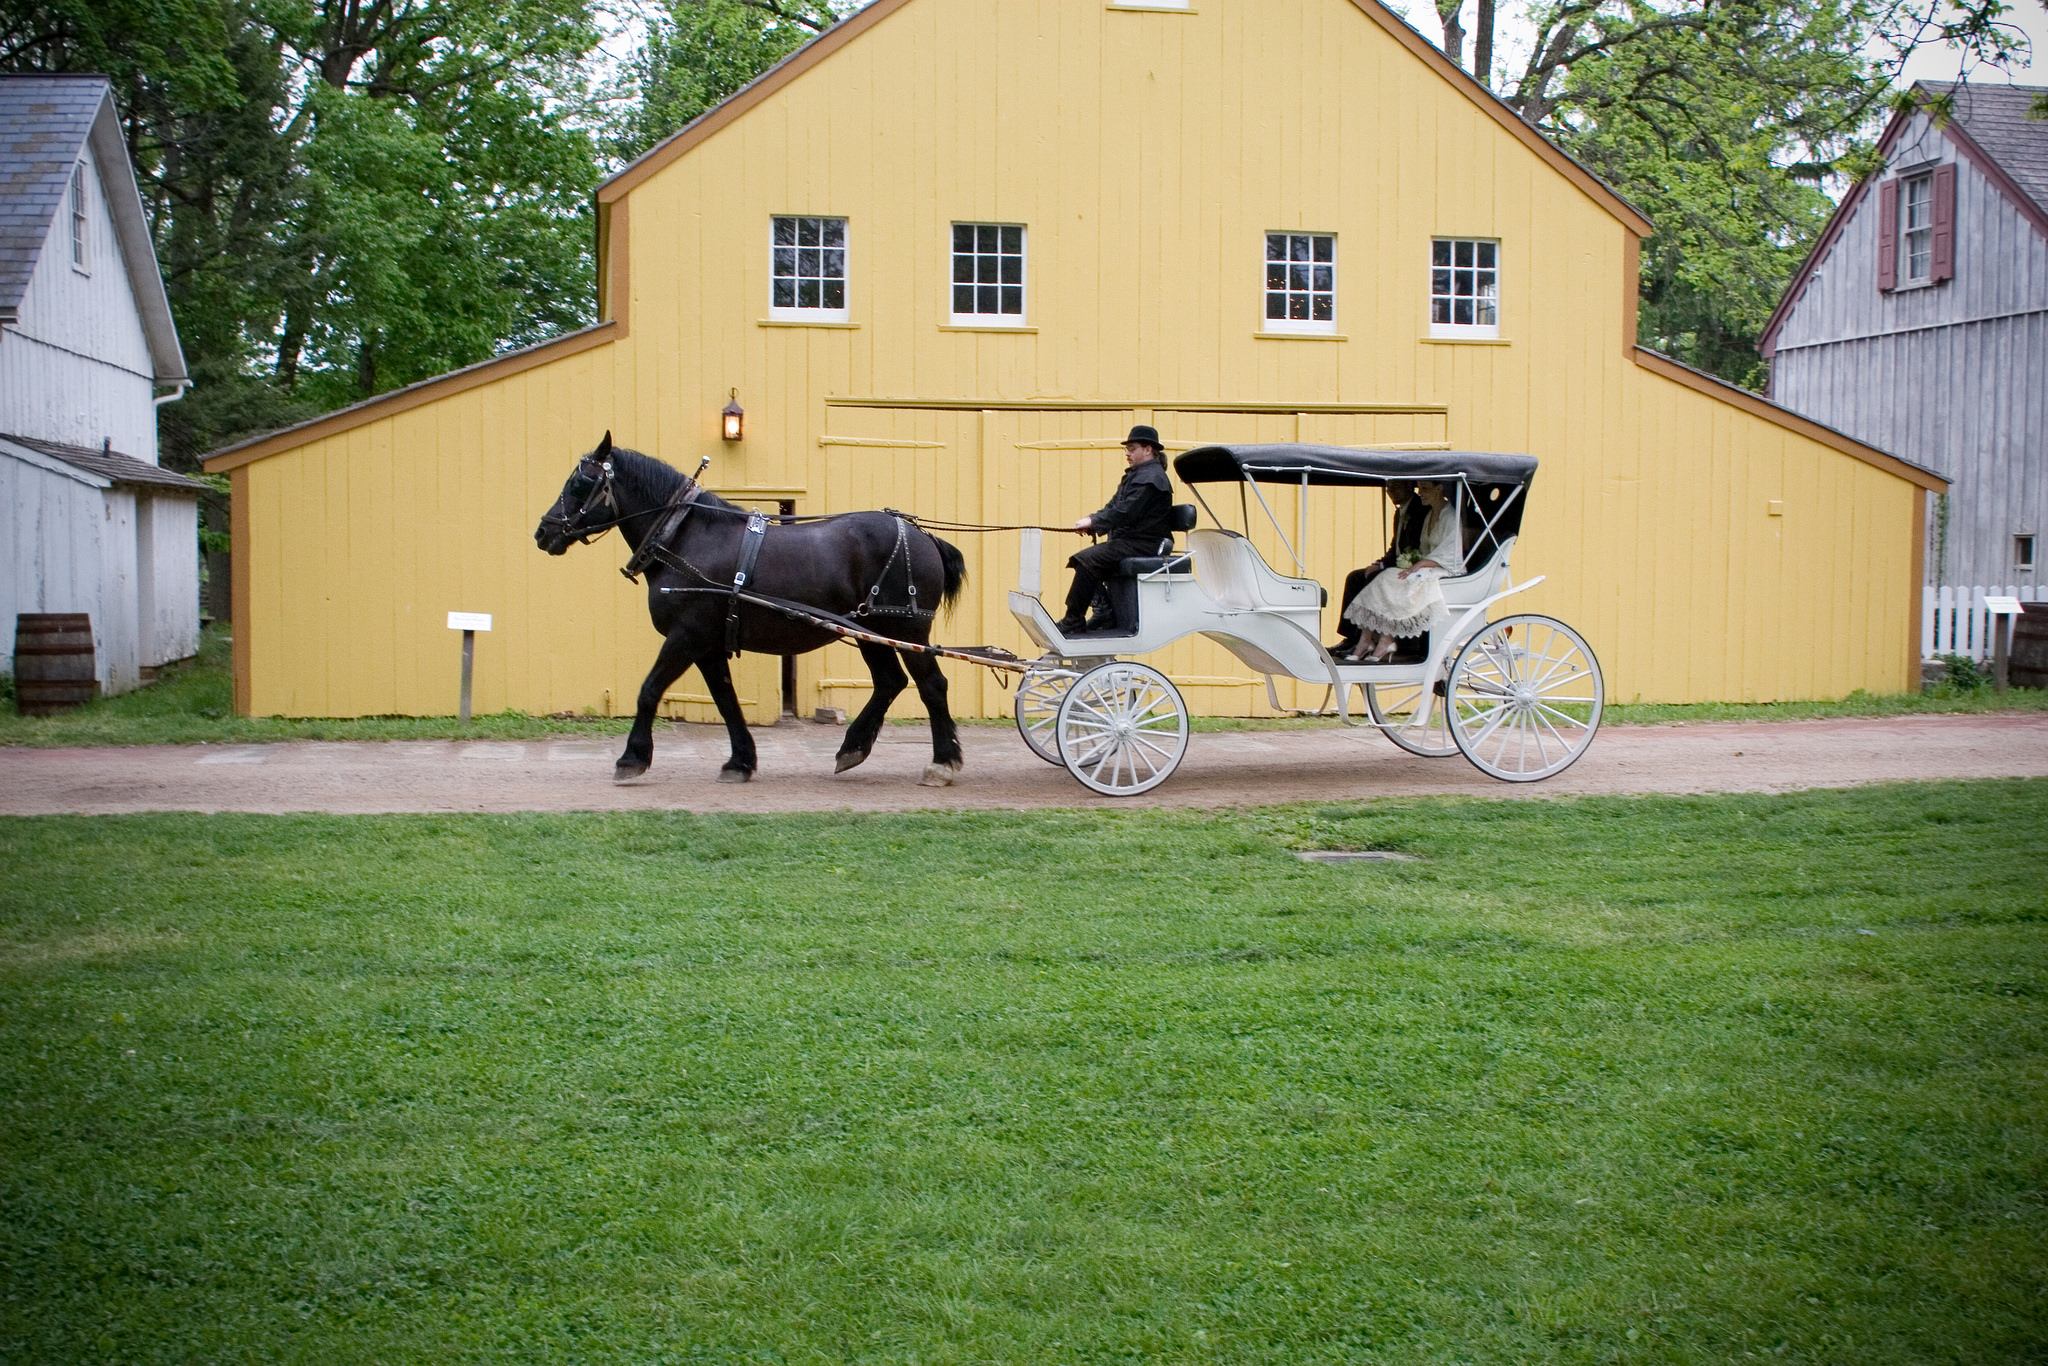 Pennsylvania Trails of History